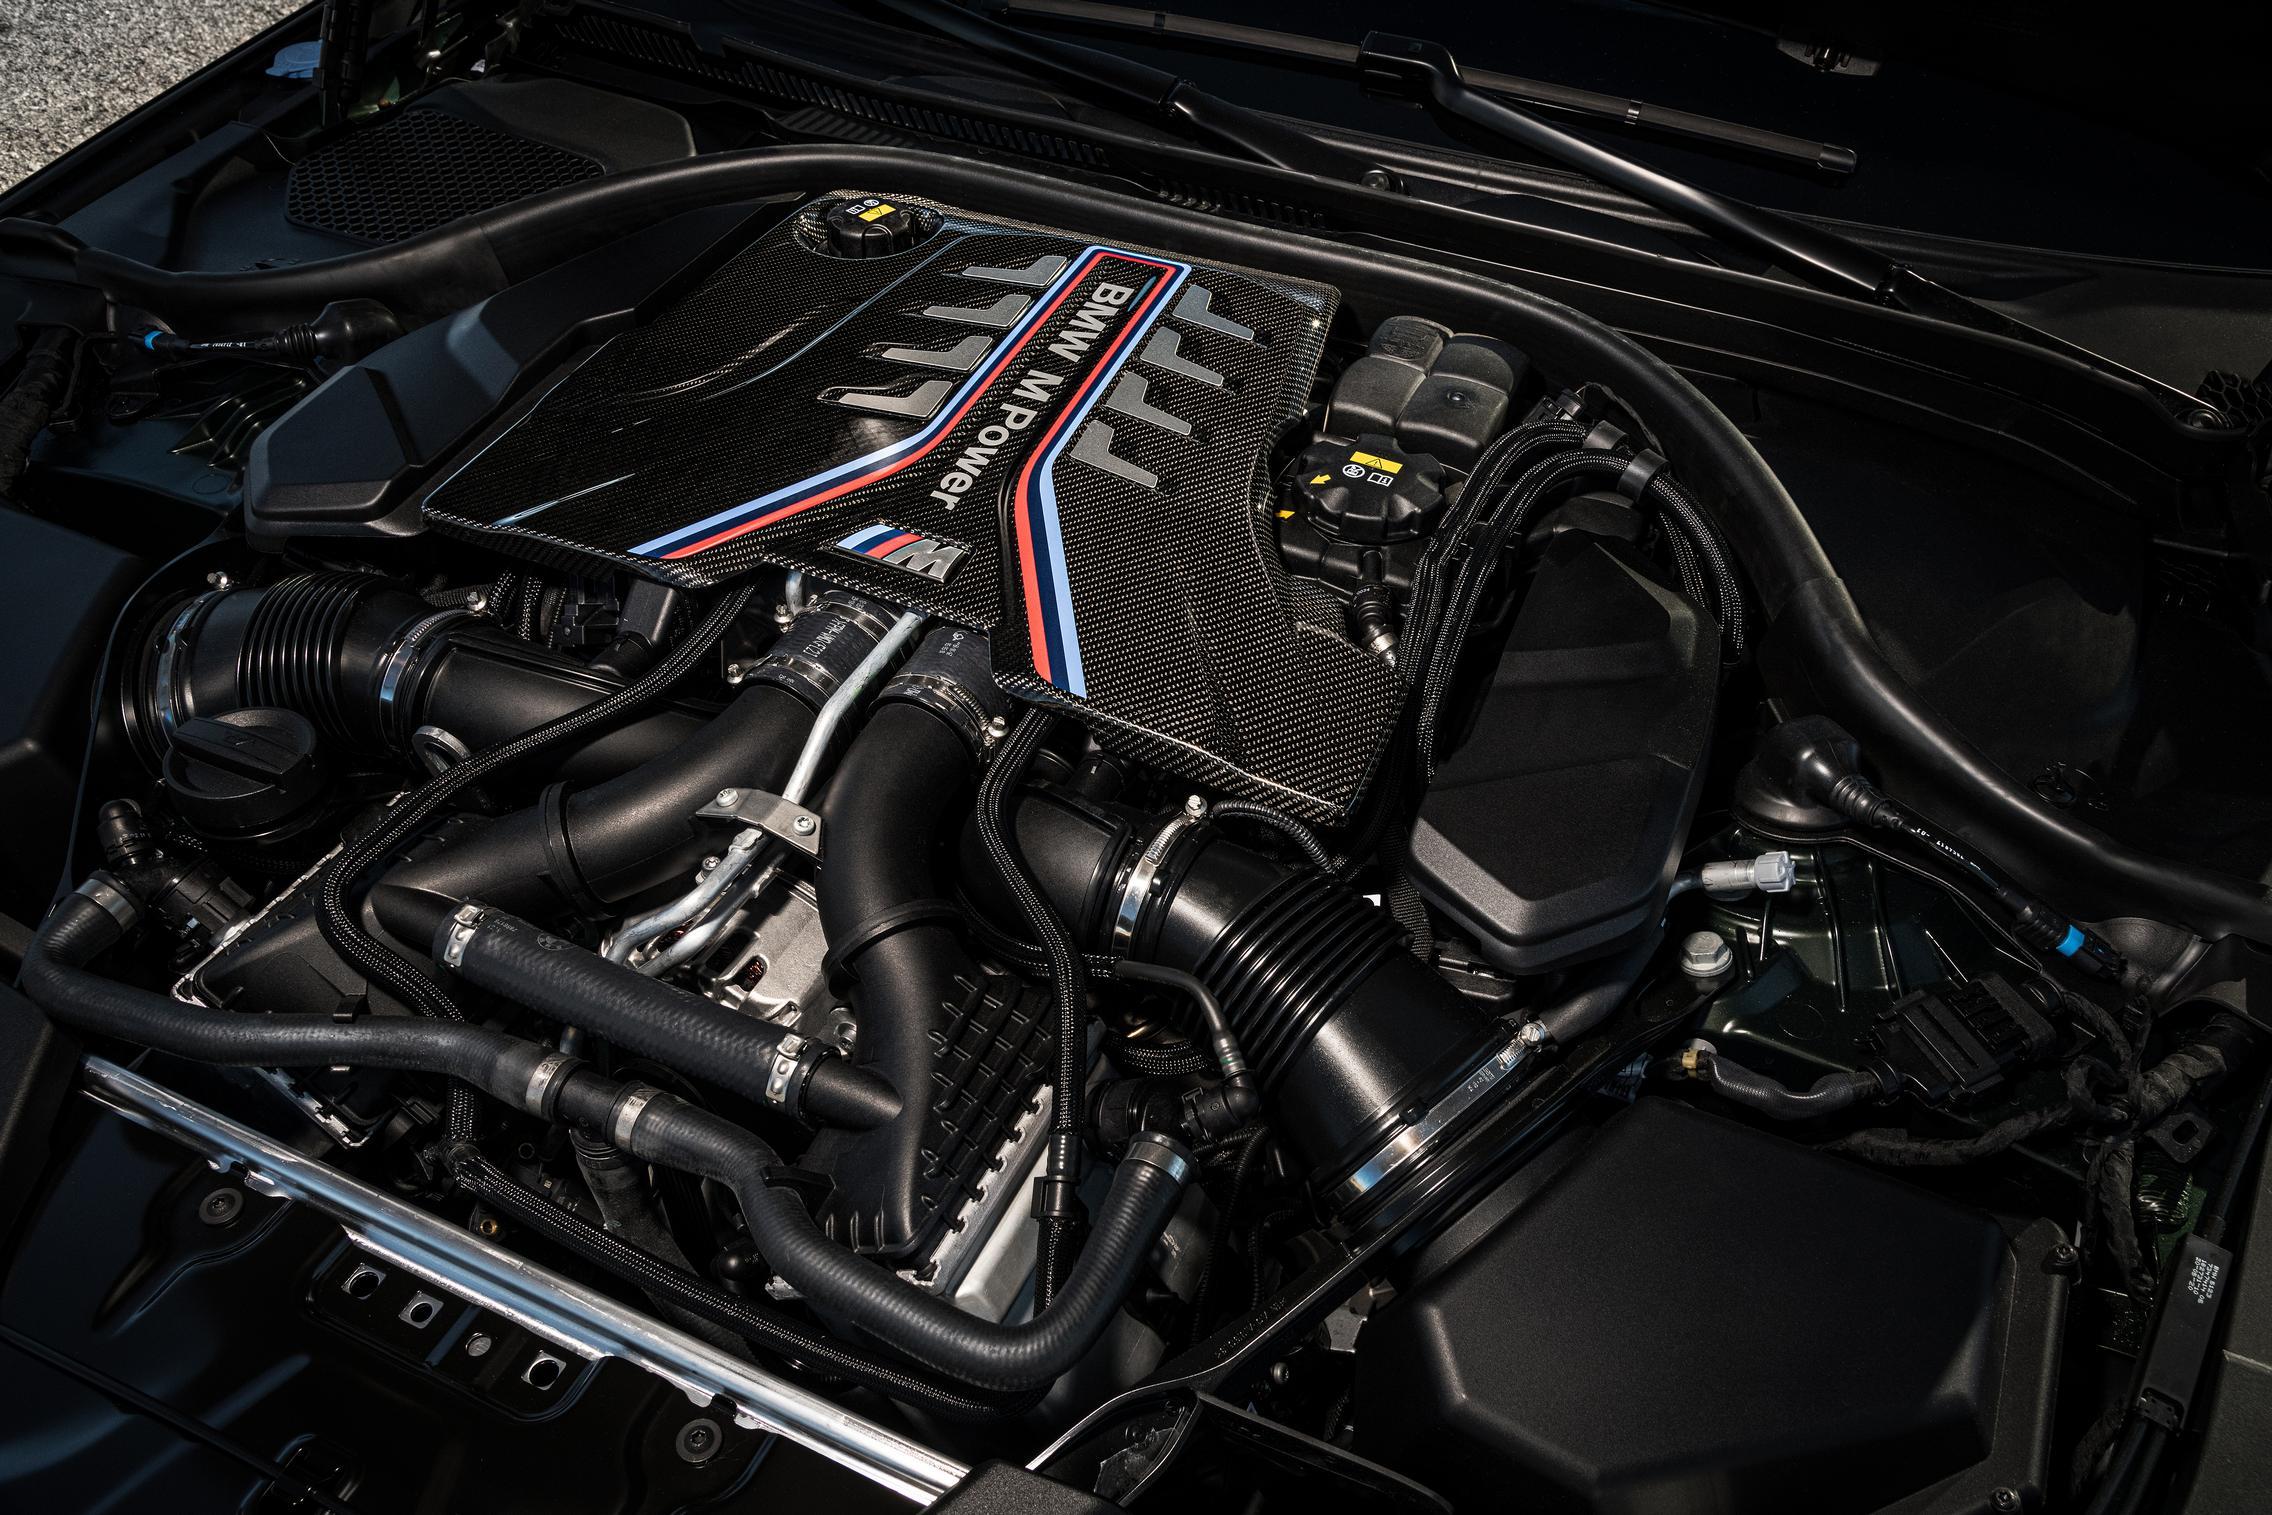 BMW M5 CS engine